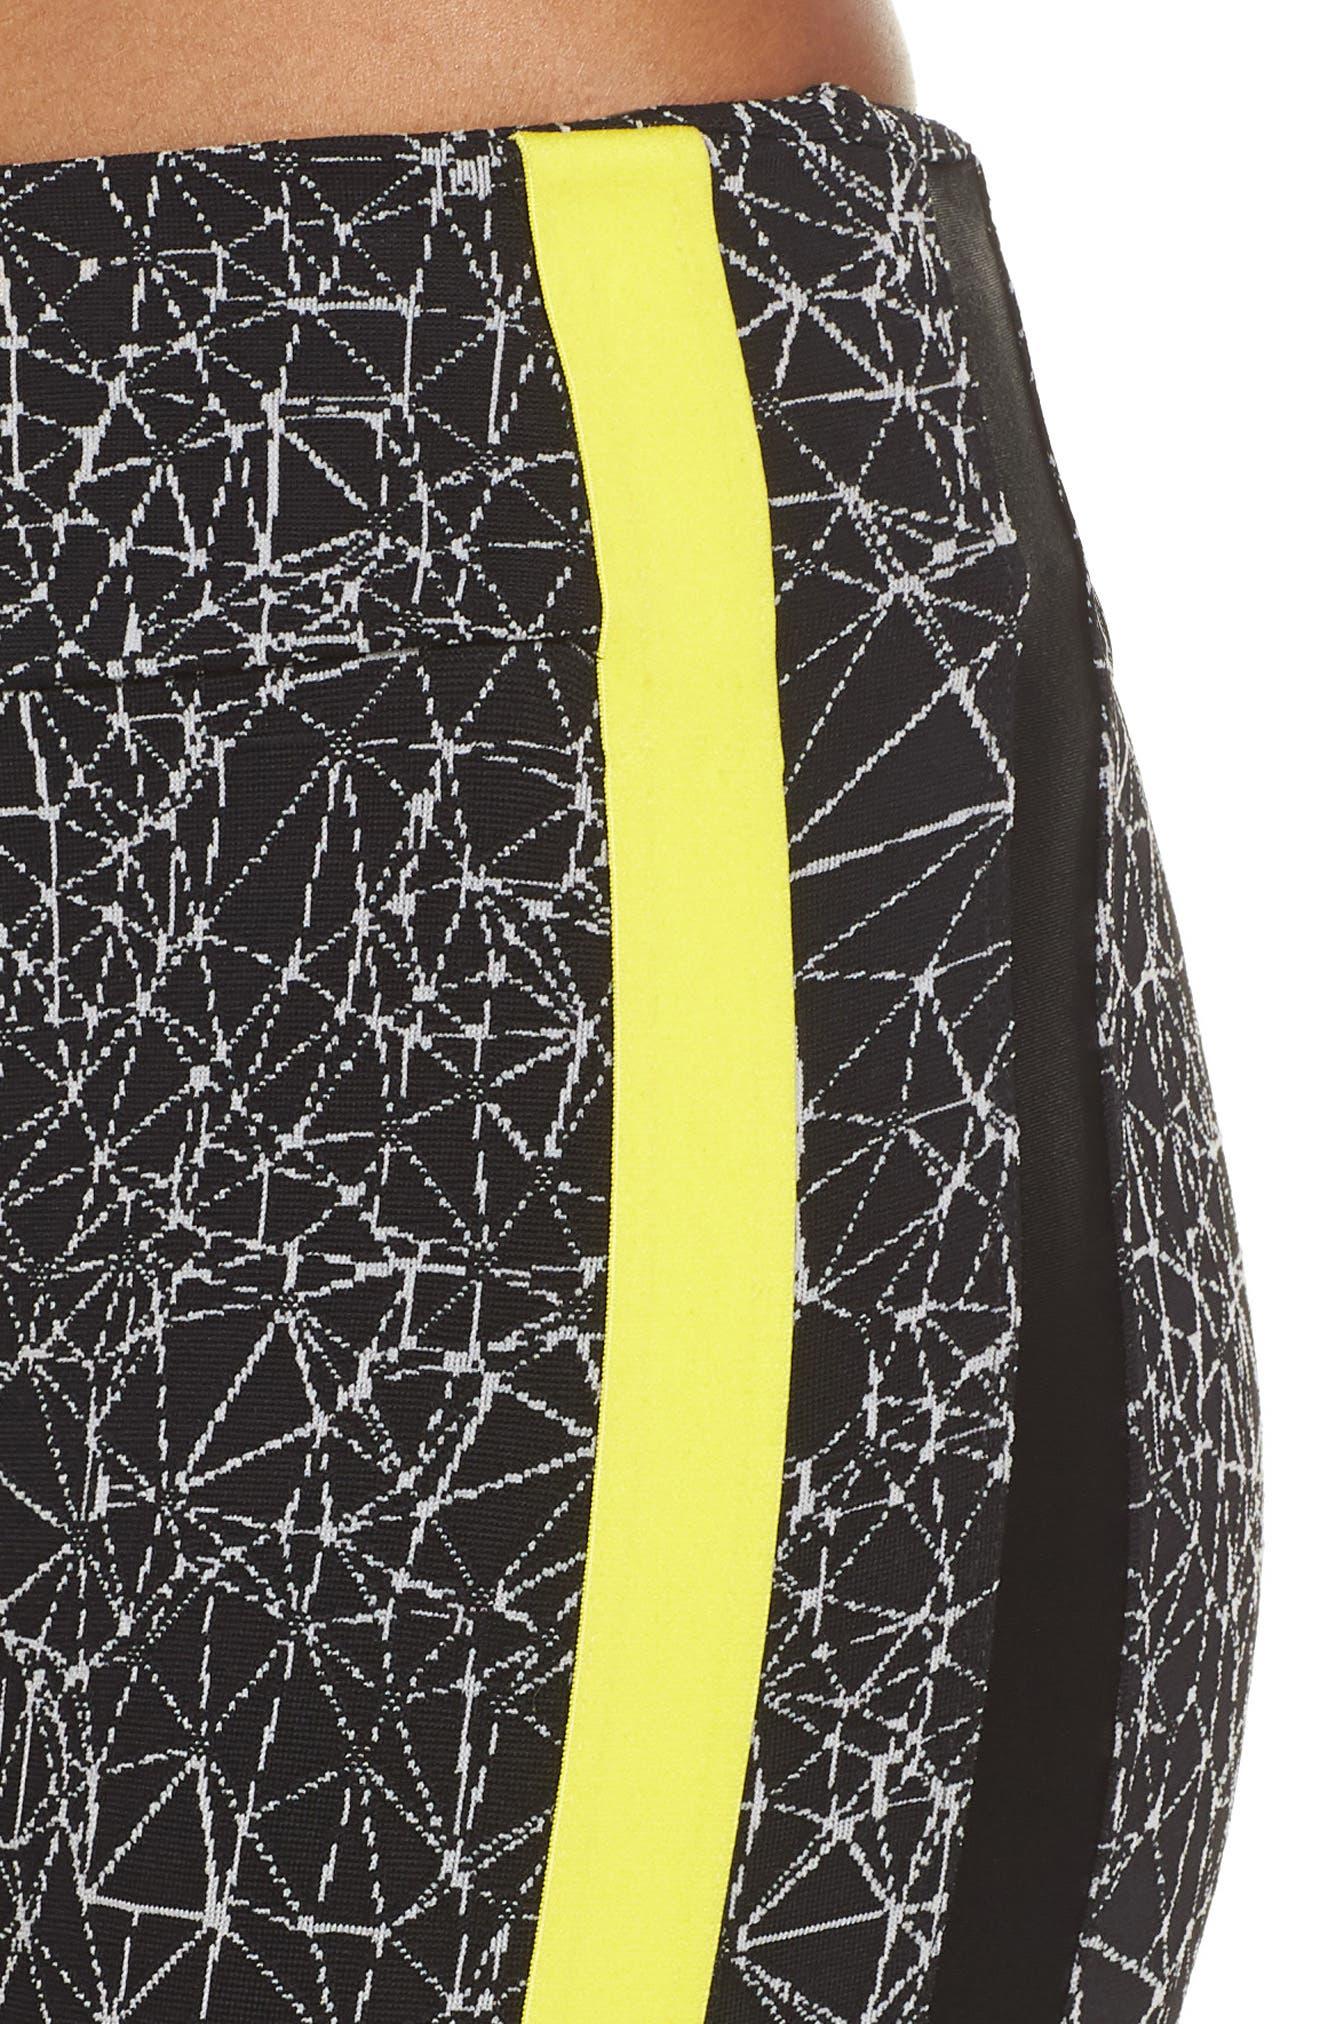 Molecular Wren High Waist Leggings,                             Alternate thumbnail 4, color,                             Molecular Black